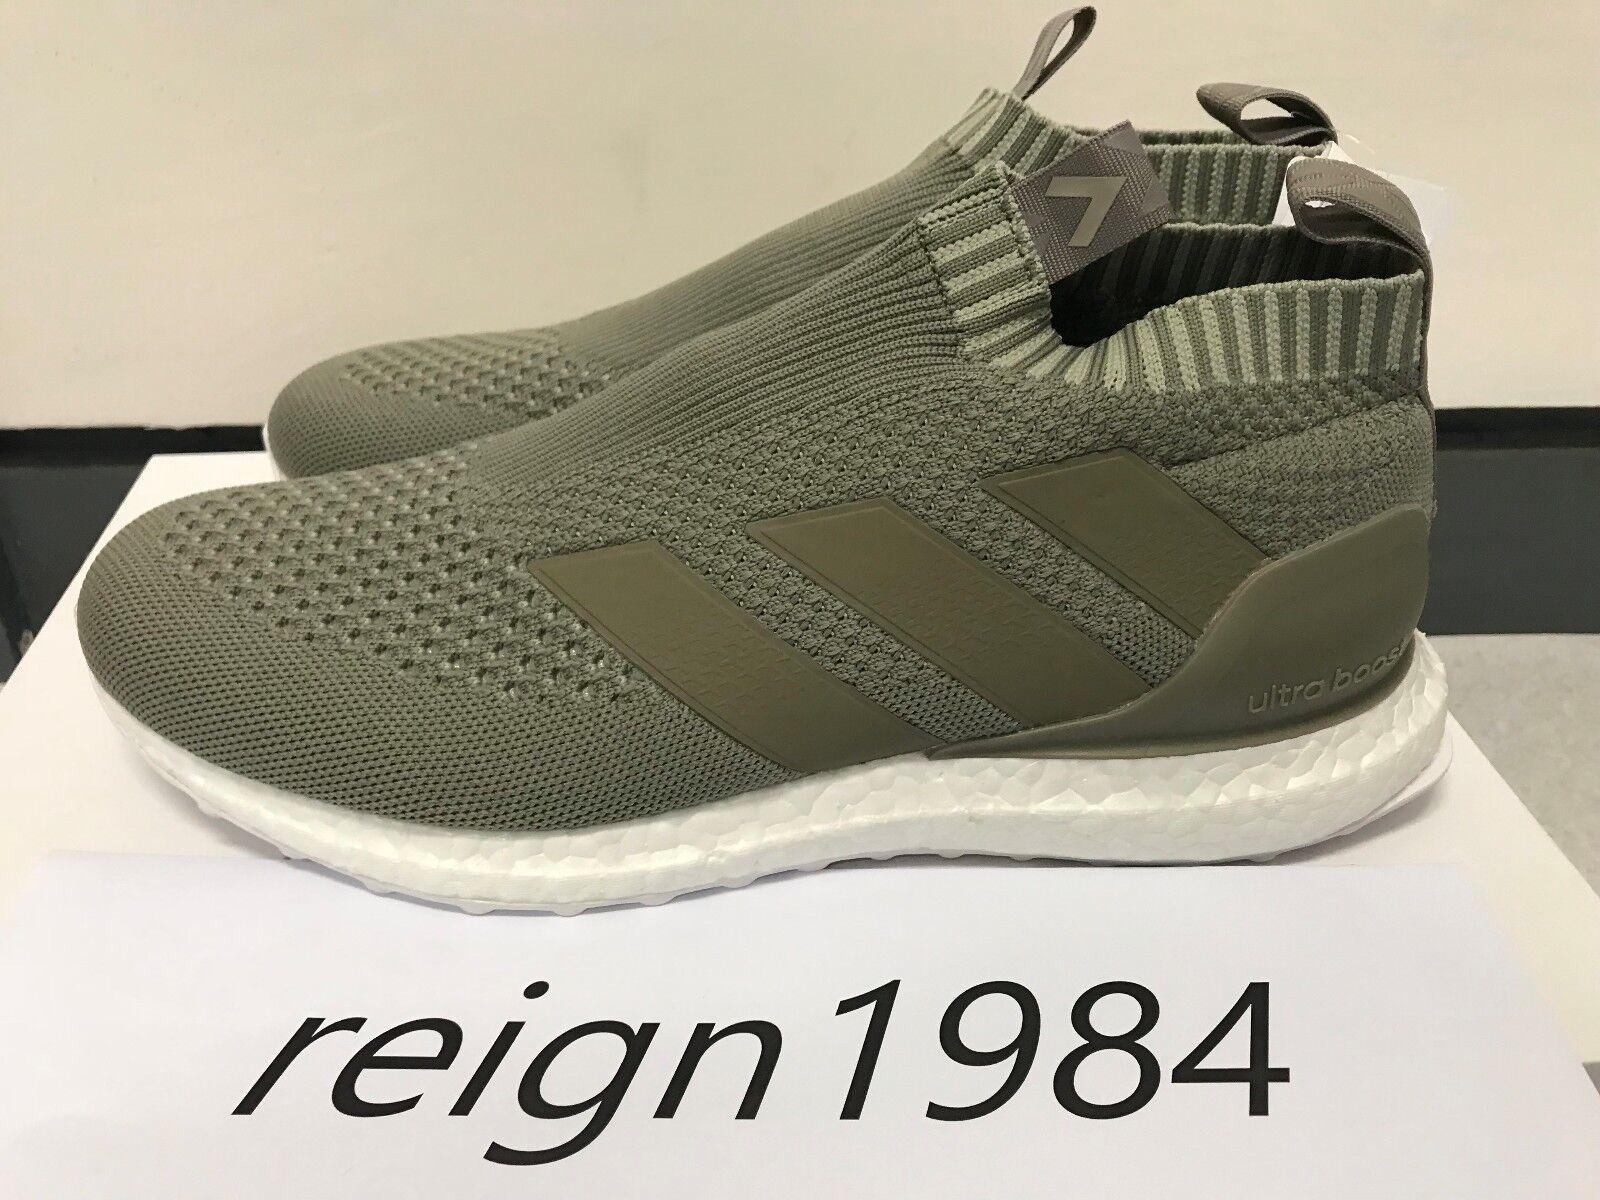 Adidas Ace 16+ Purecontrol Ultra Boost Clay Sesame CG3655 US 10